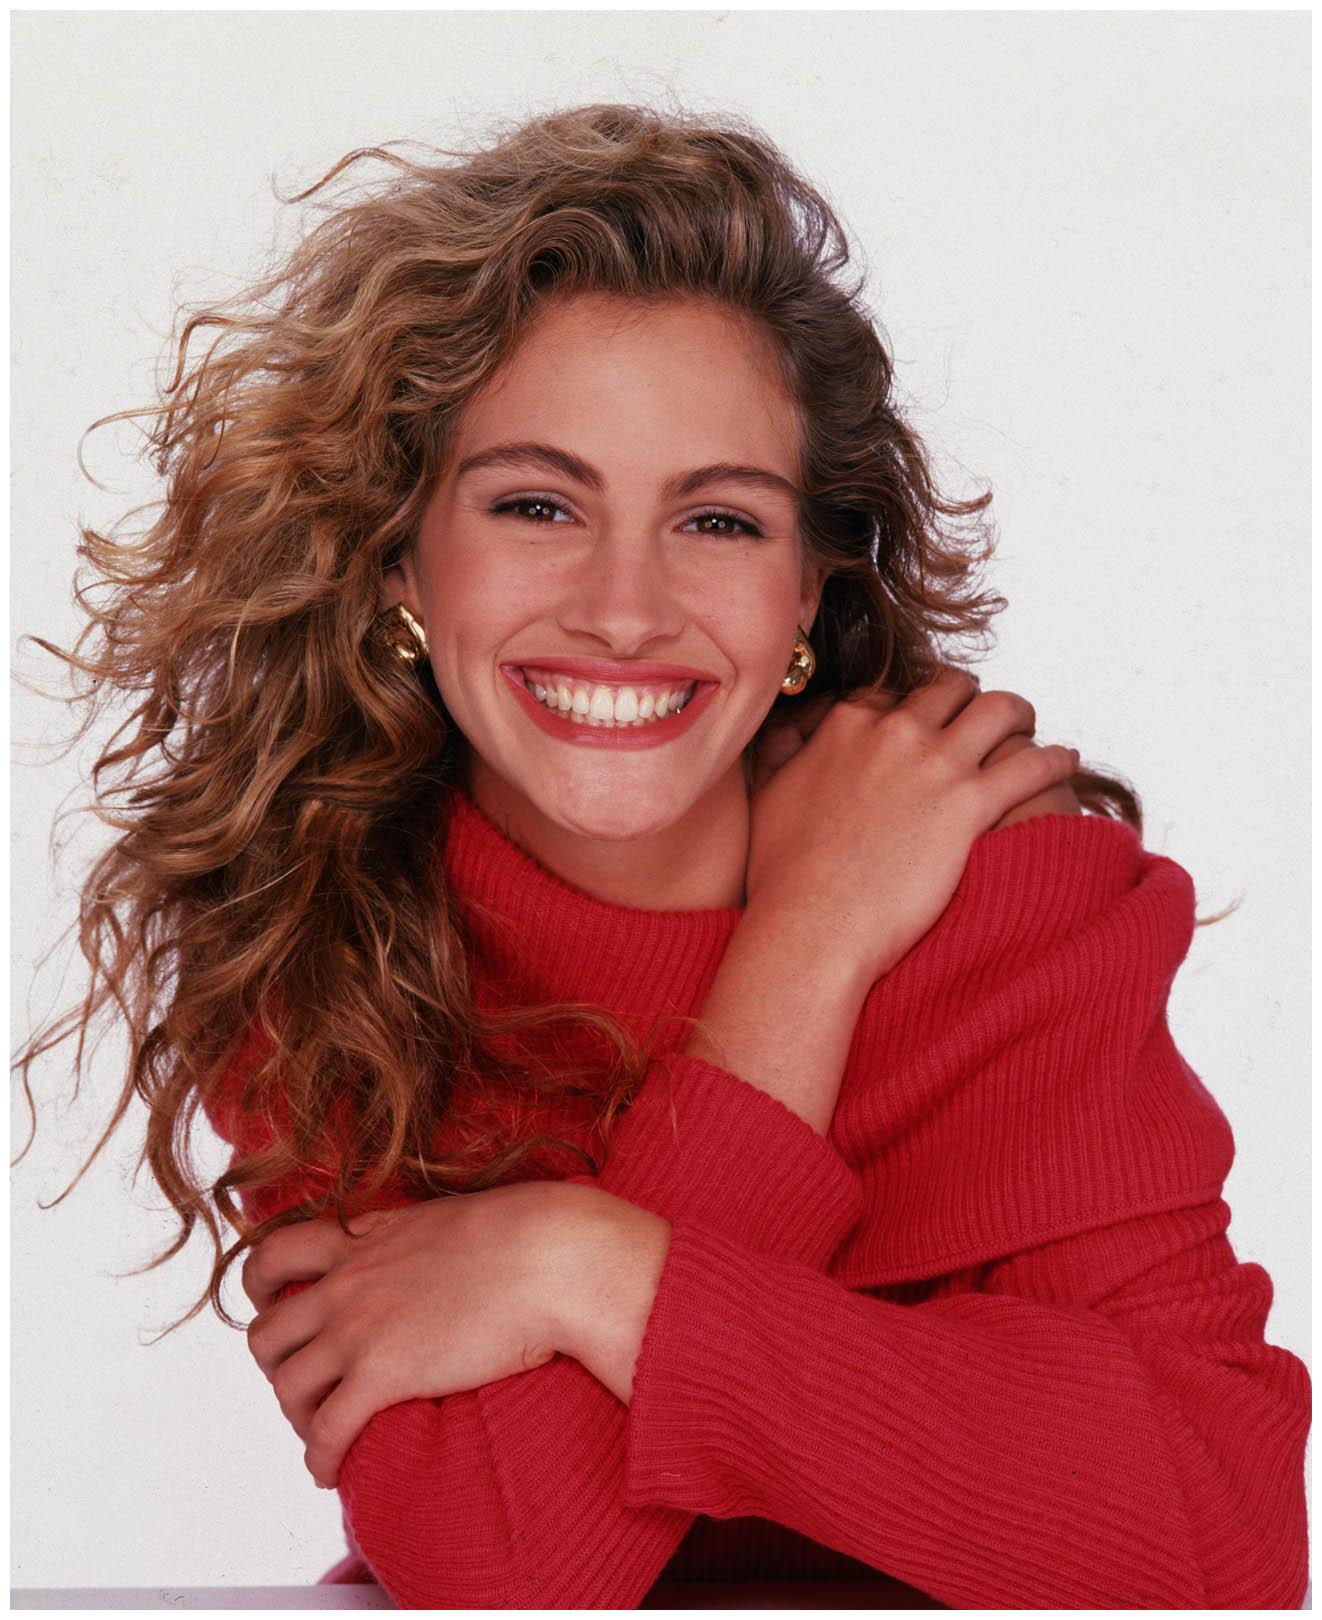 julia-roberts-photo-jaques-malignon-1989